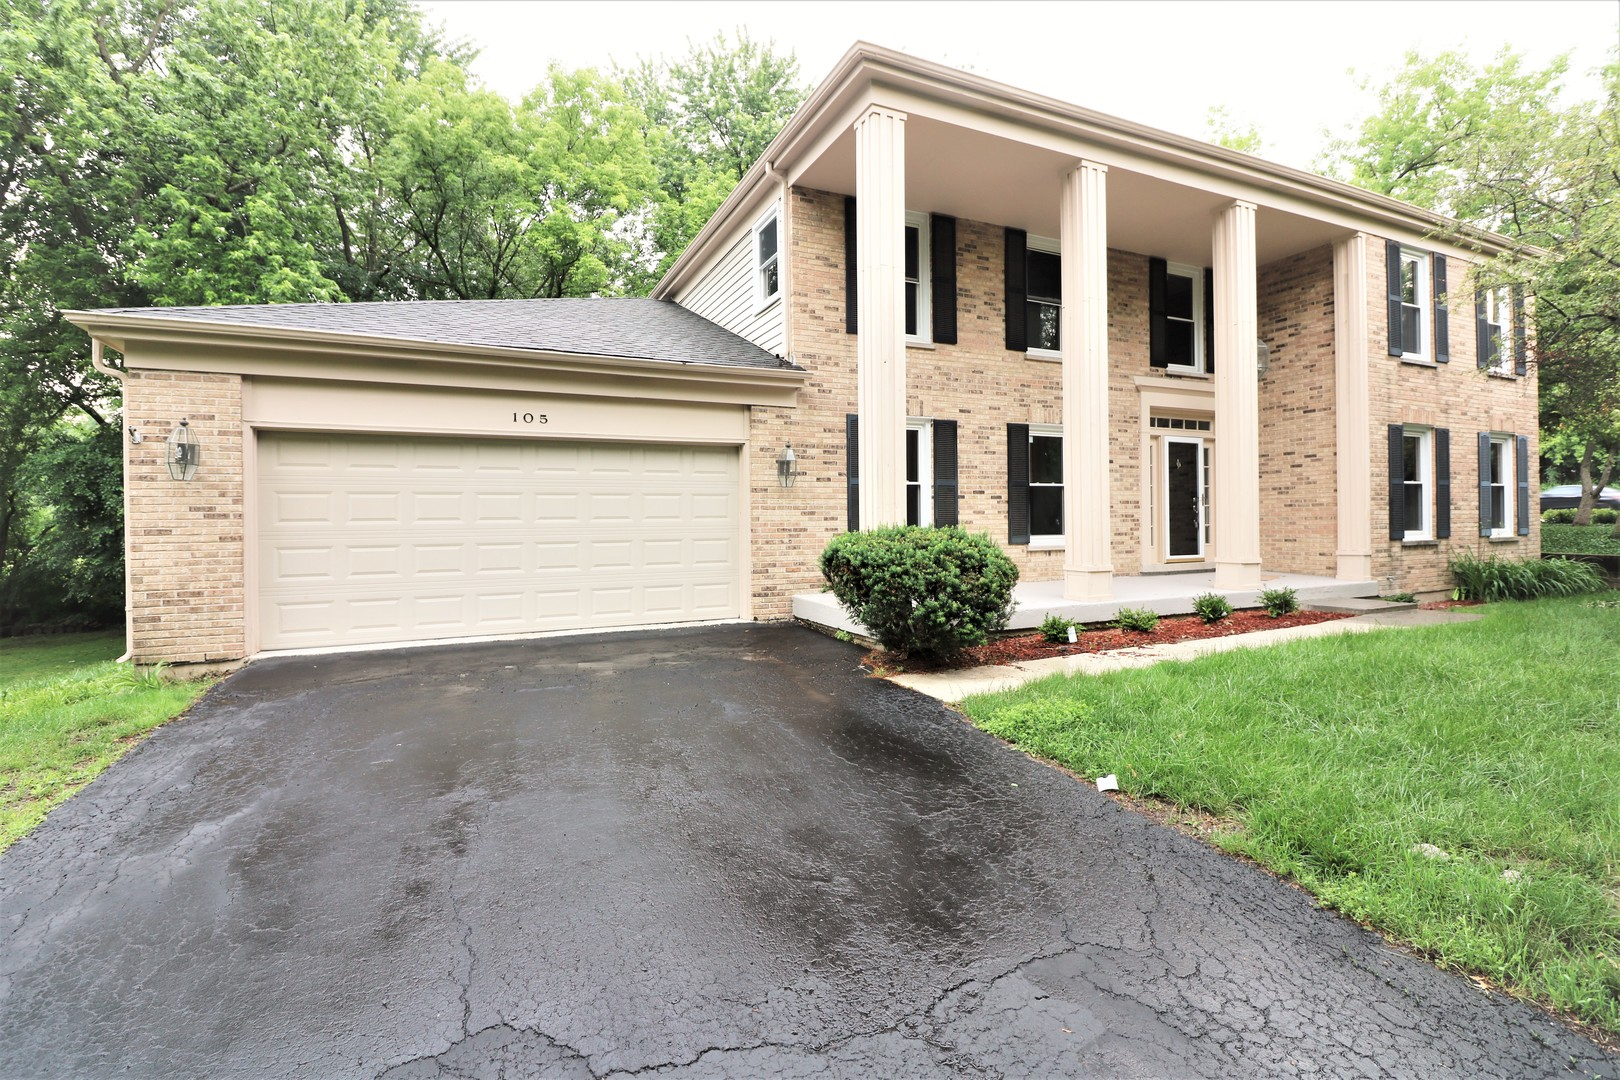 105 Covington ,Barrington, Illinois 60010